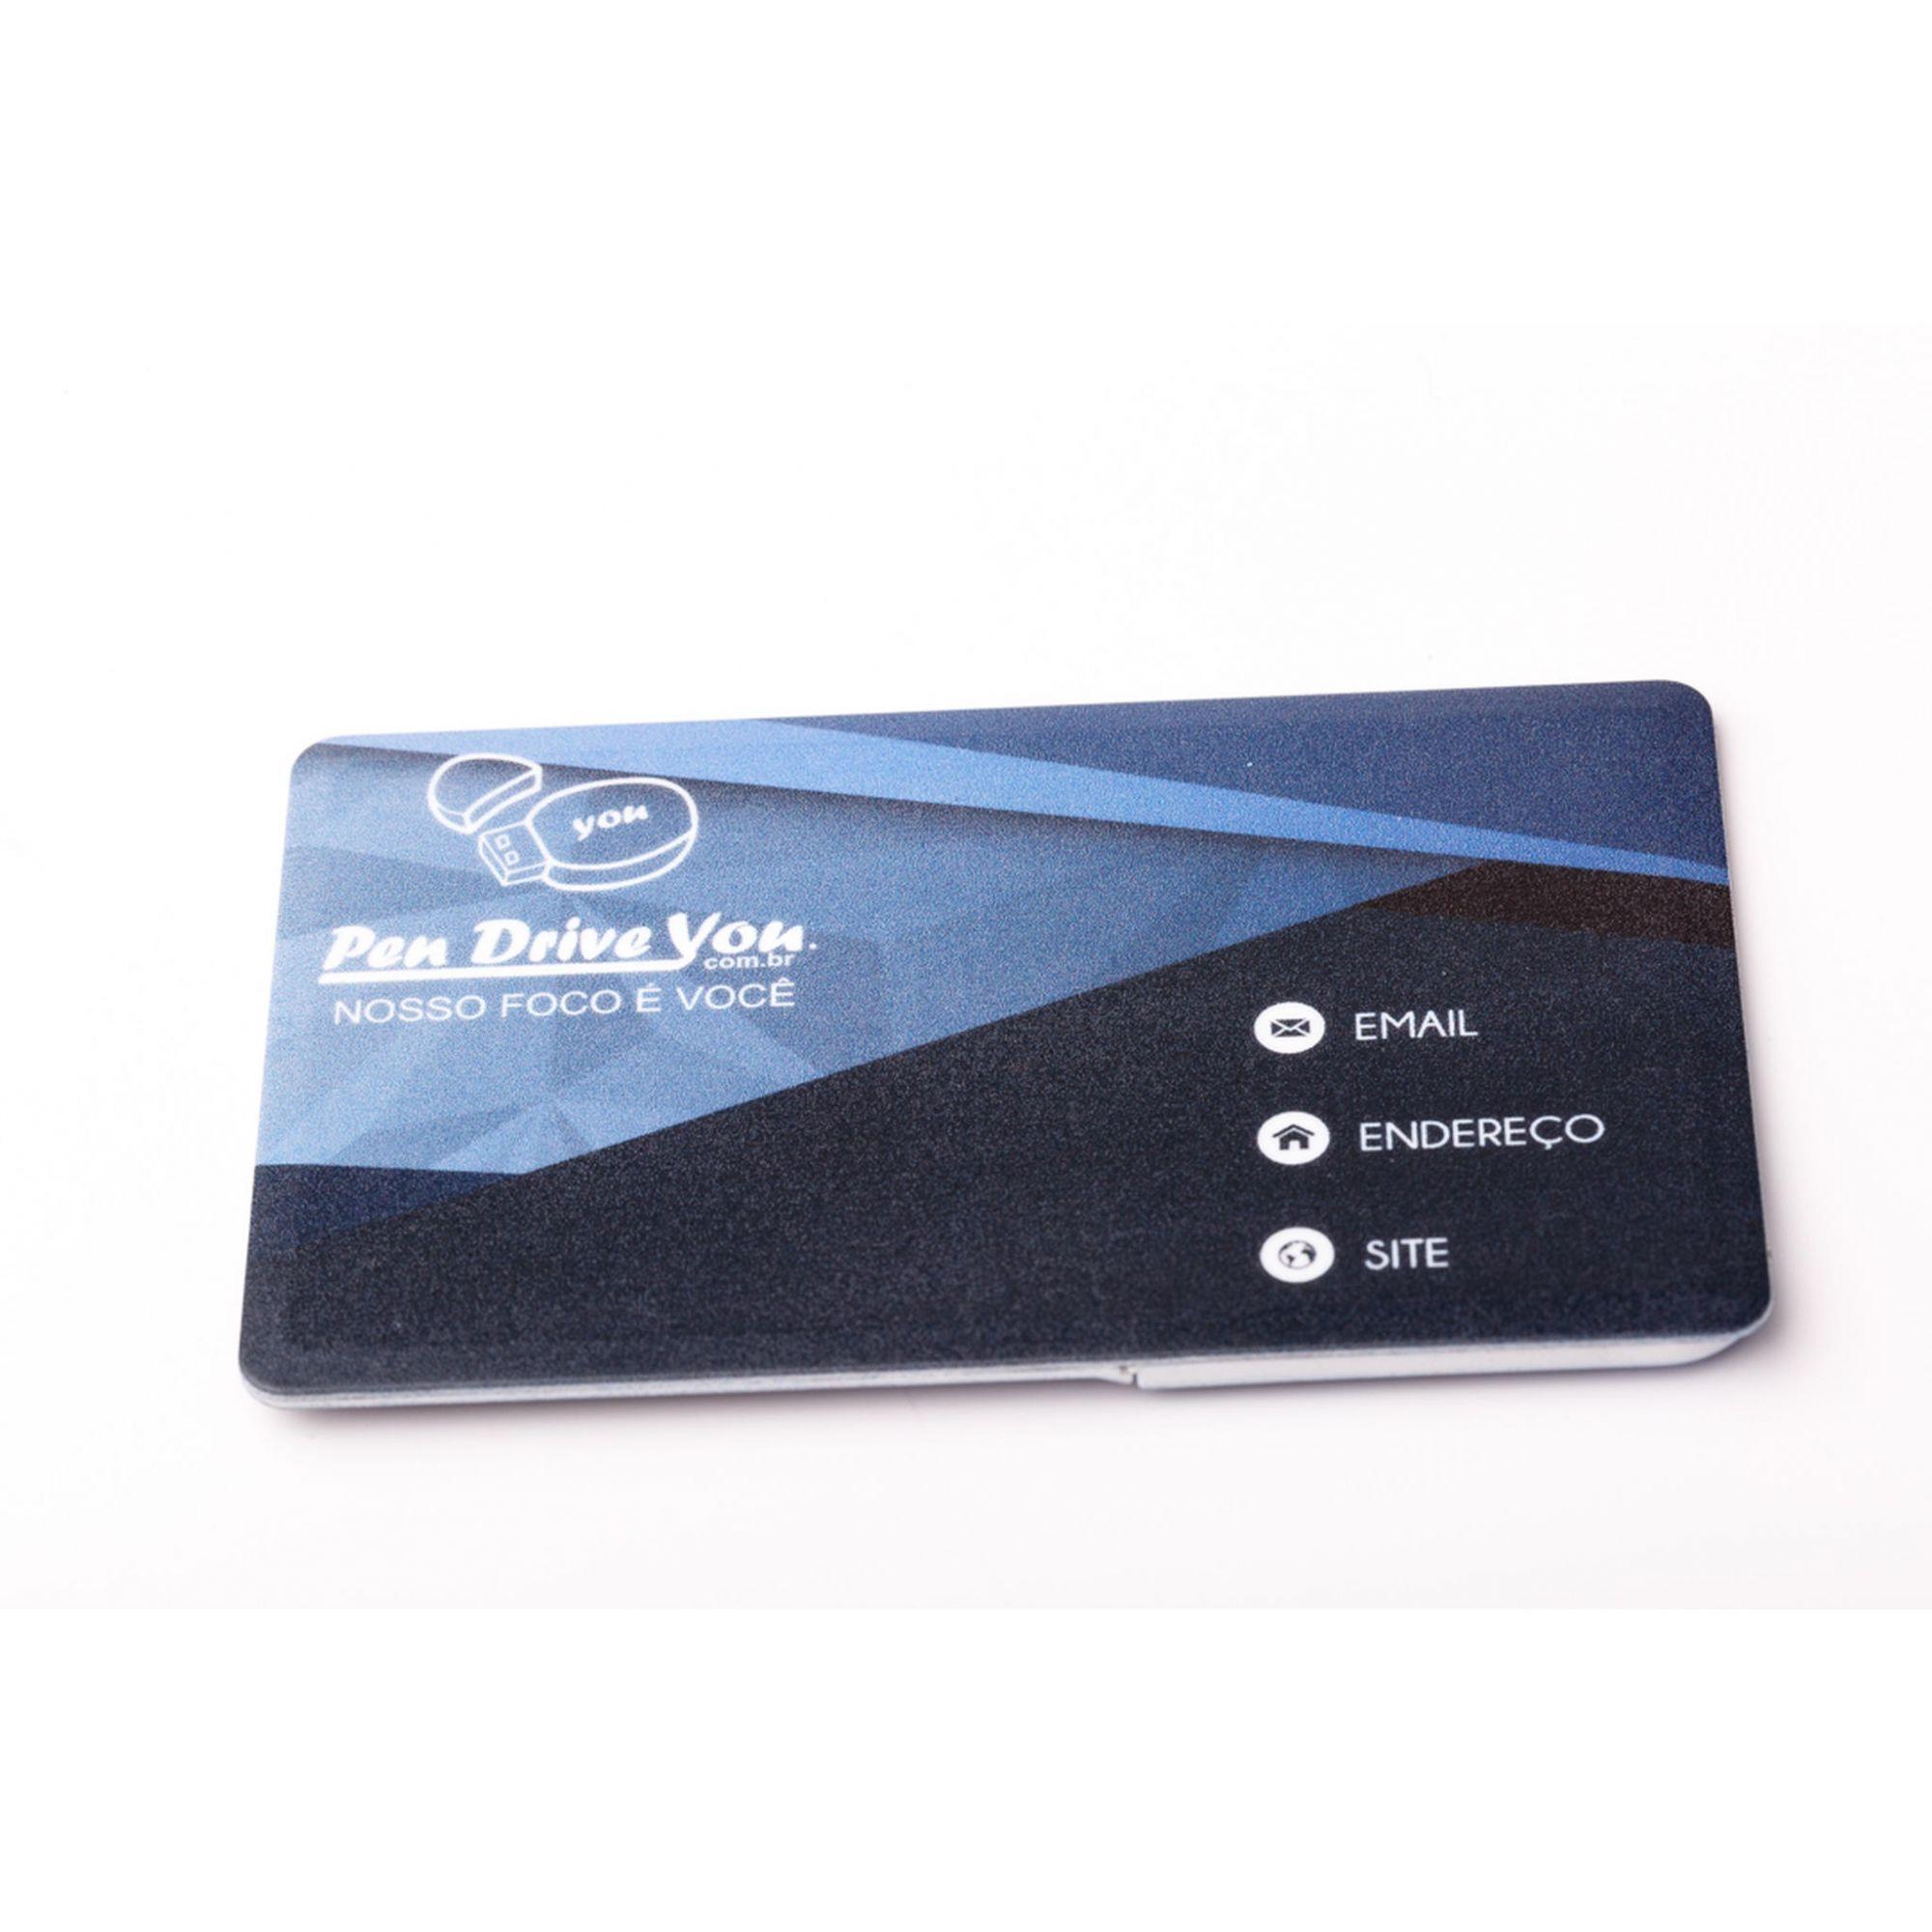 Pen Card Plástico Branco Retangular Canivete Personalizado